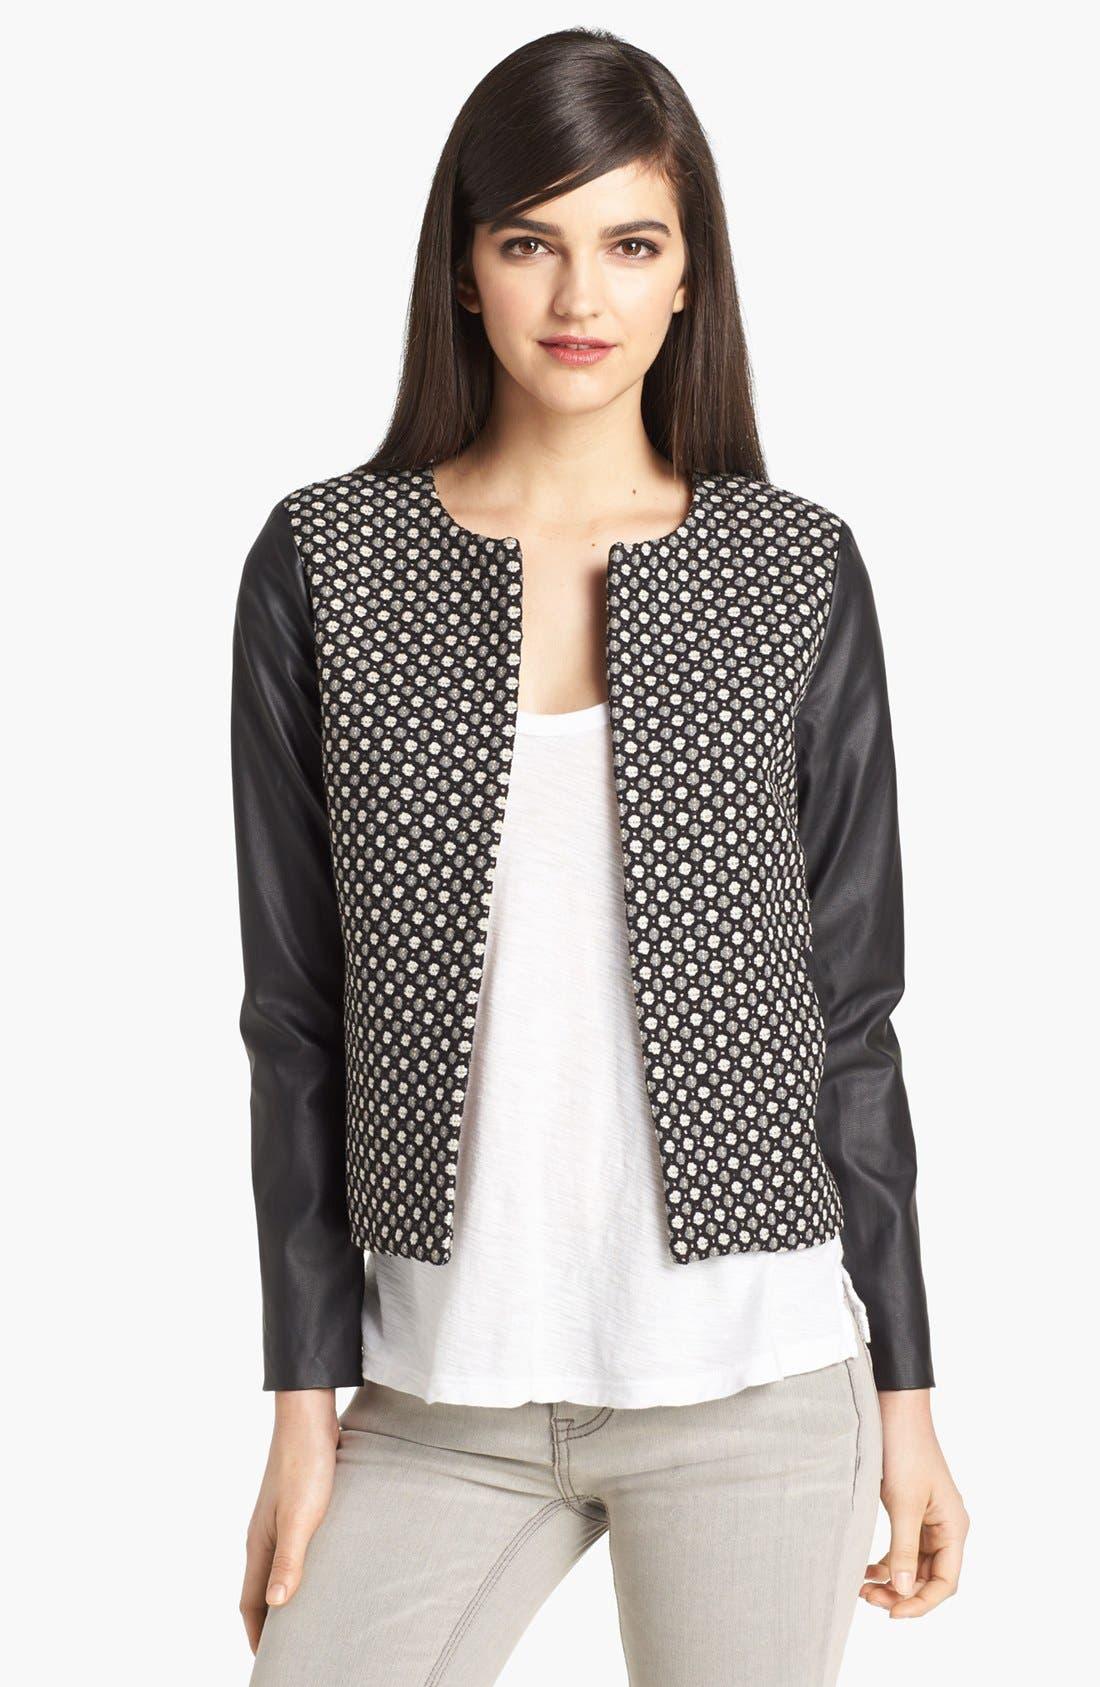 Alternate Image 1 Selected - Pure Sugar Faux Leather Sleeve Jacquard Jacket